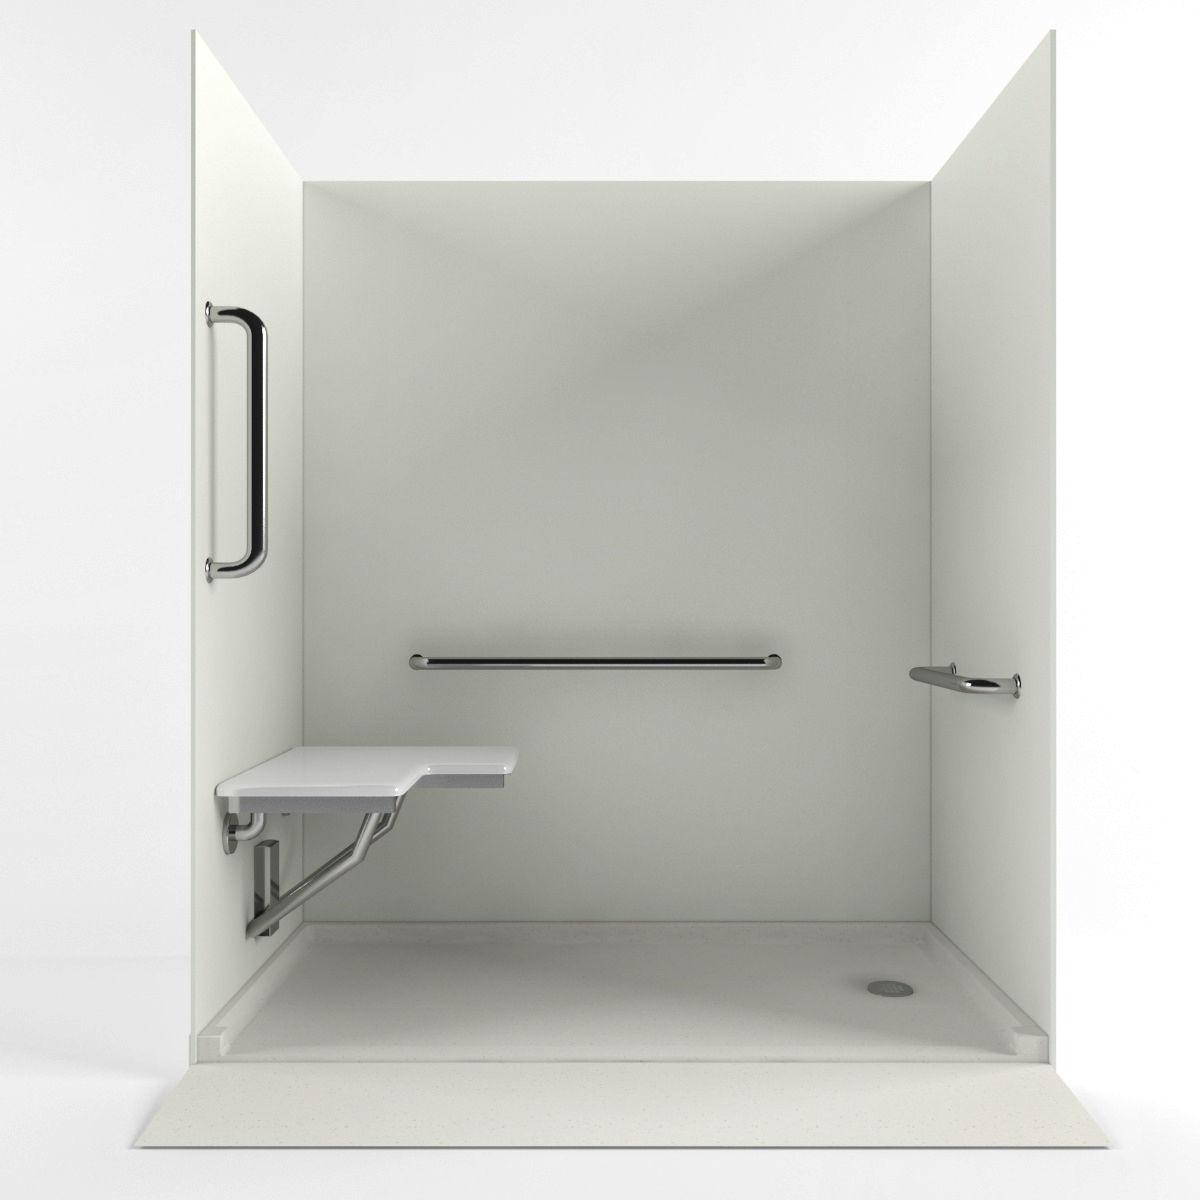 3d model swanstone bathtub and shower wall panels